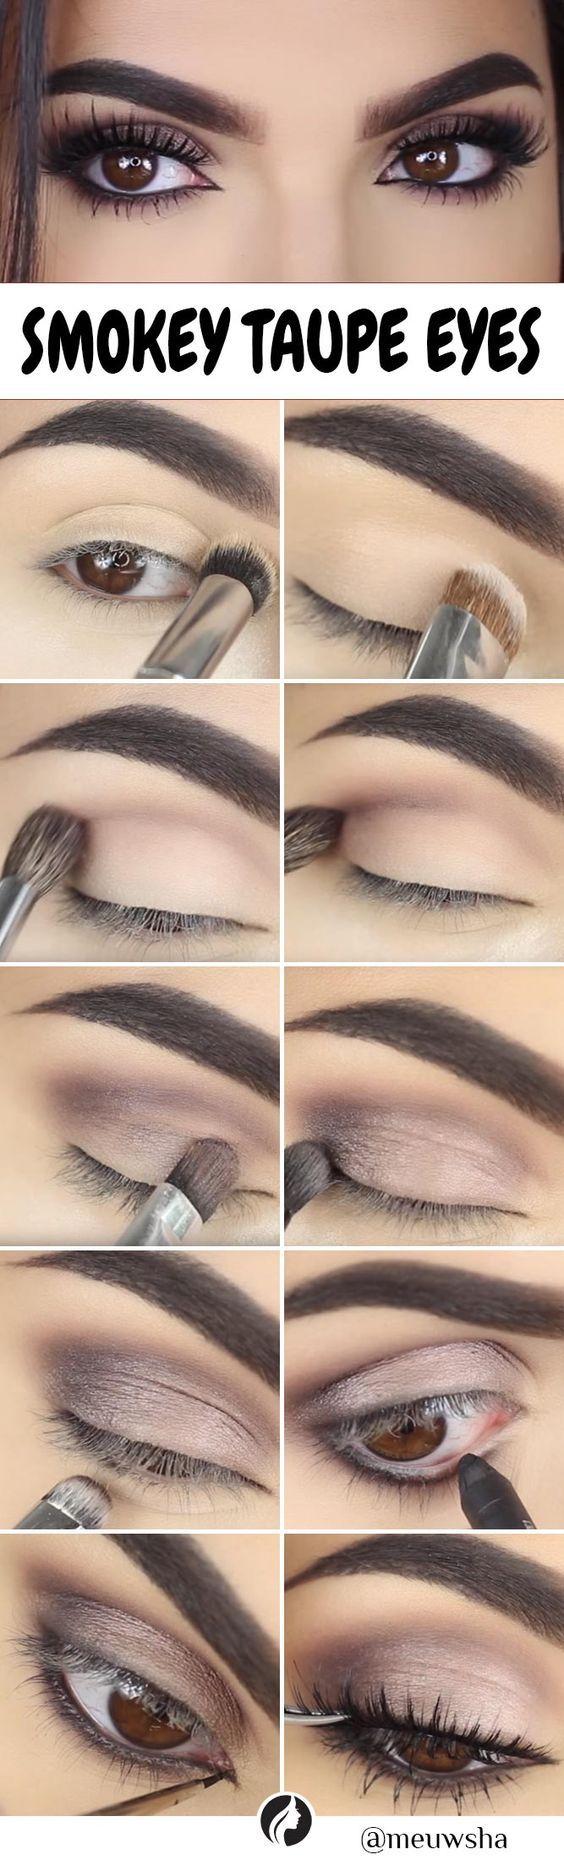 10 Must Know Makeup Secrets That Makeup Professionals Use